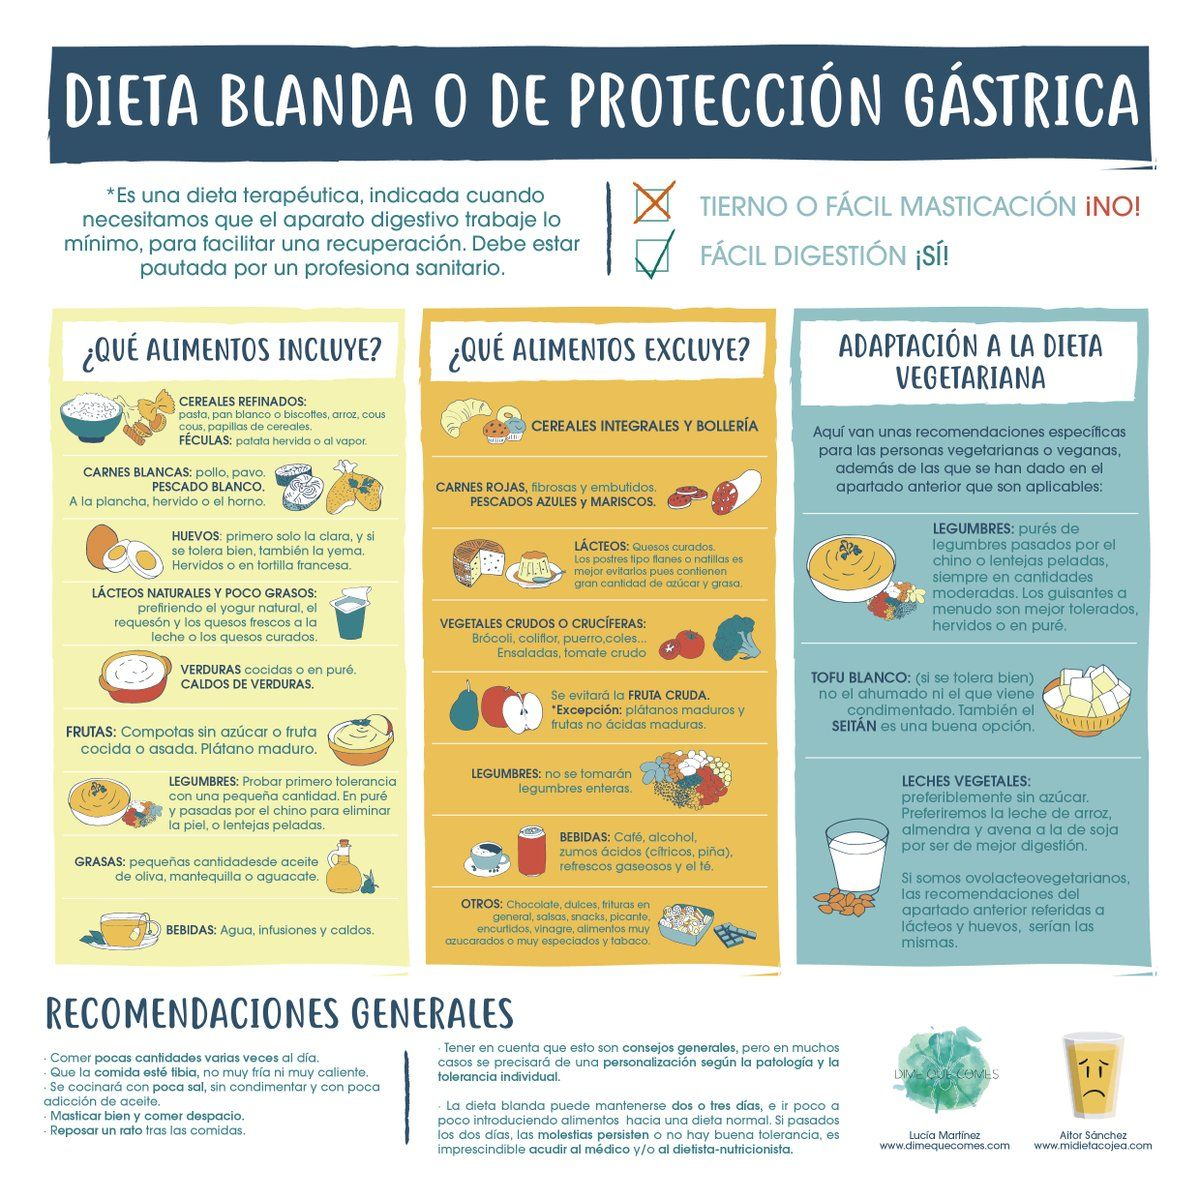 Aitor Sánchez García (Midietacojea) Twitter Dieta